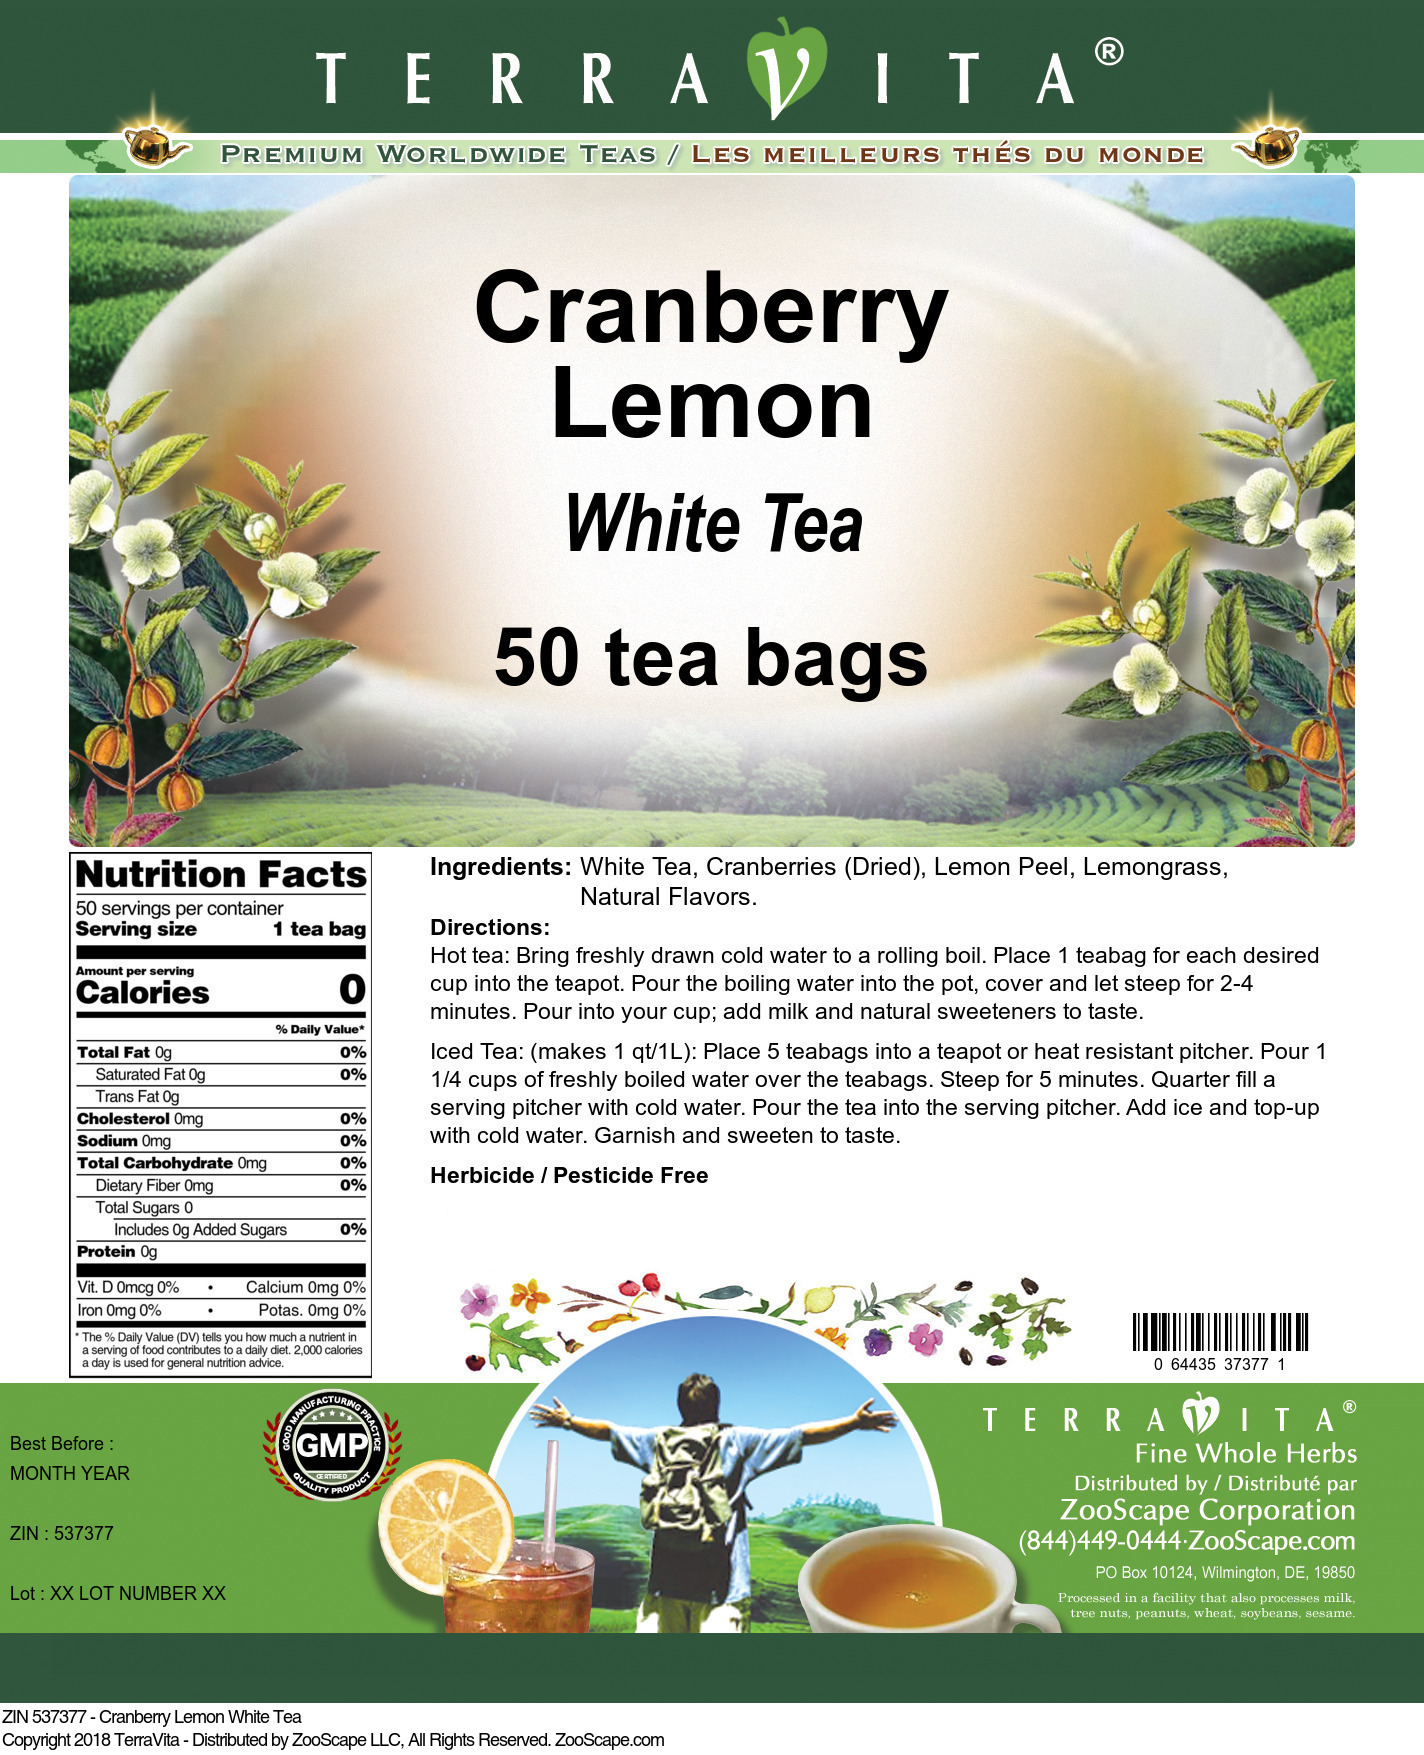 Cranberry Lemon White Tea